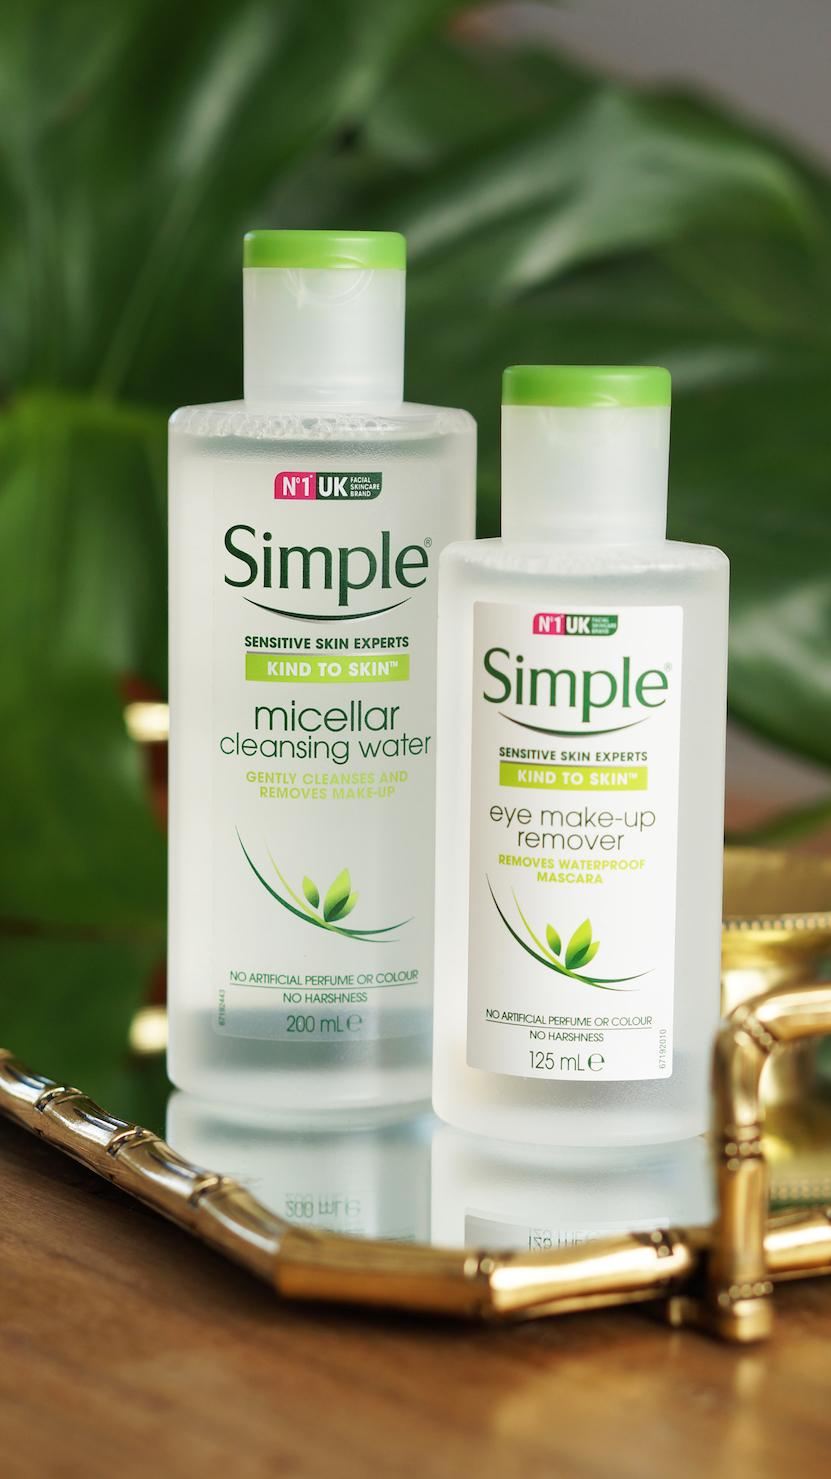 Simple Sensitive Skin Experts